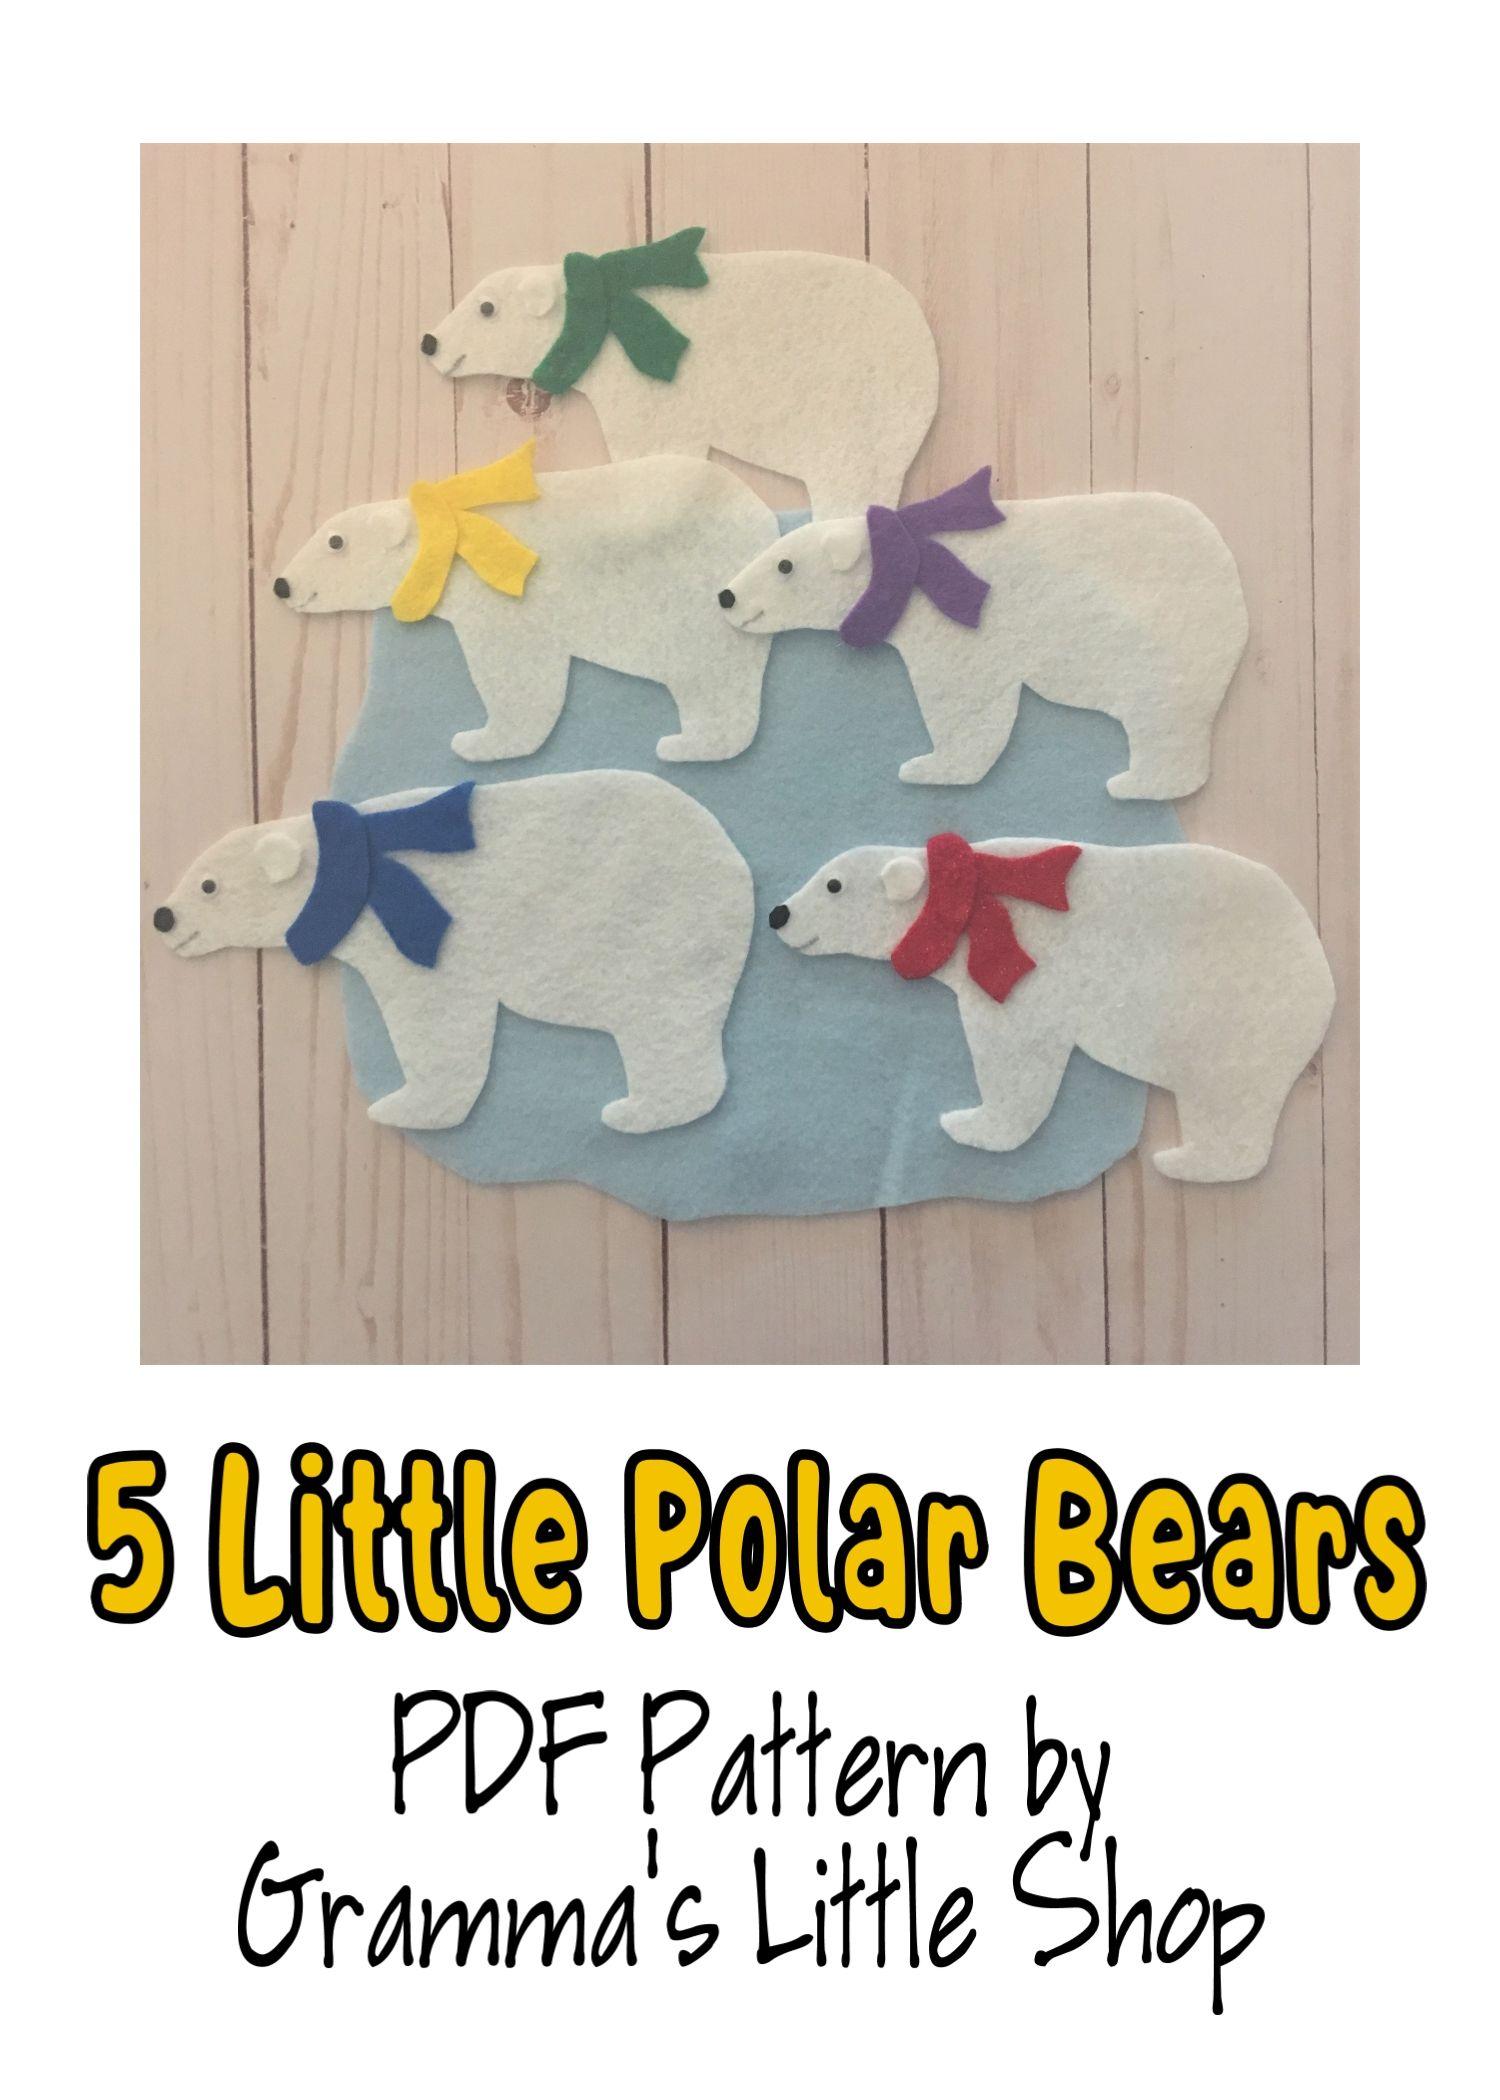 5 Little Polar Bears Felt Story Pattern